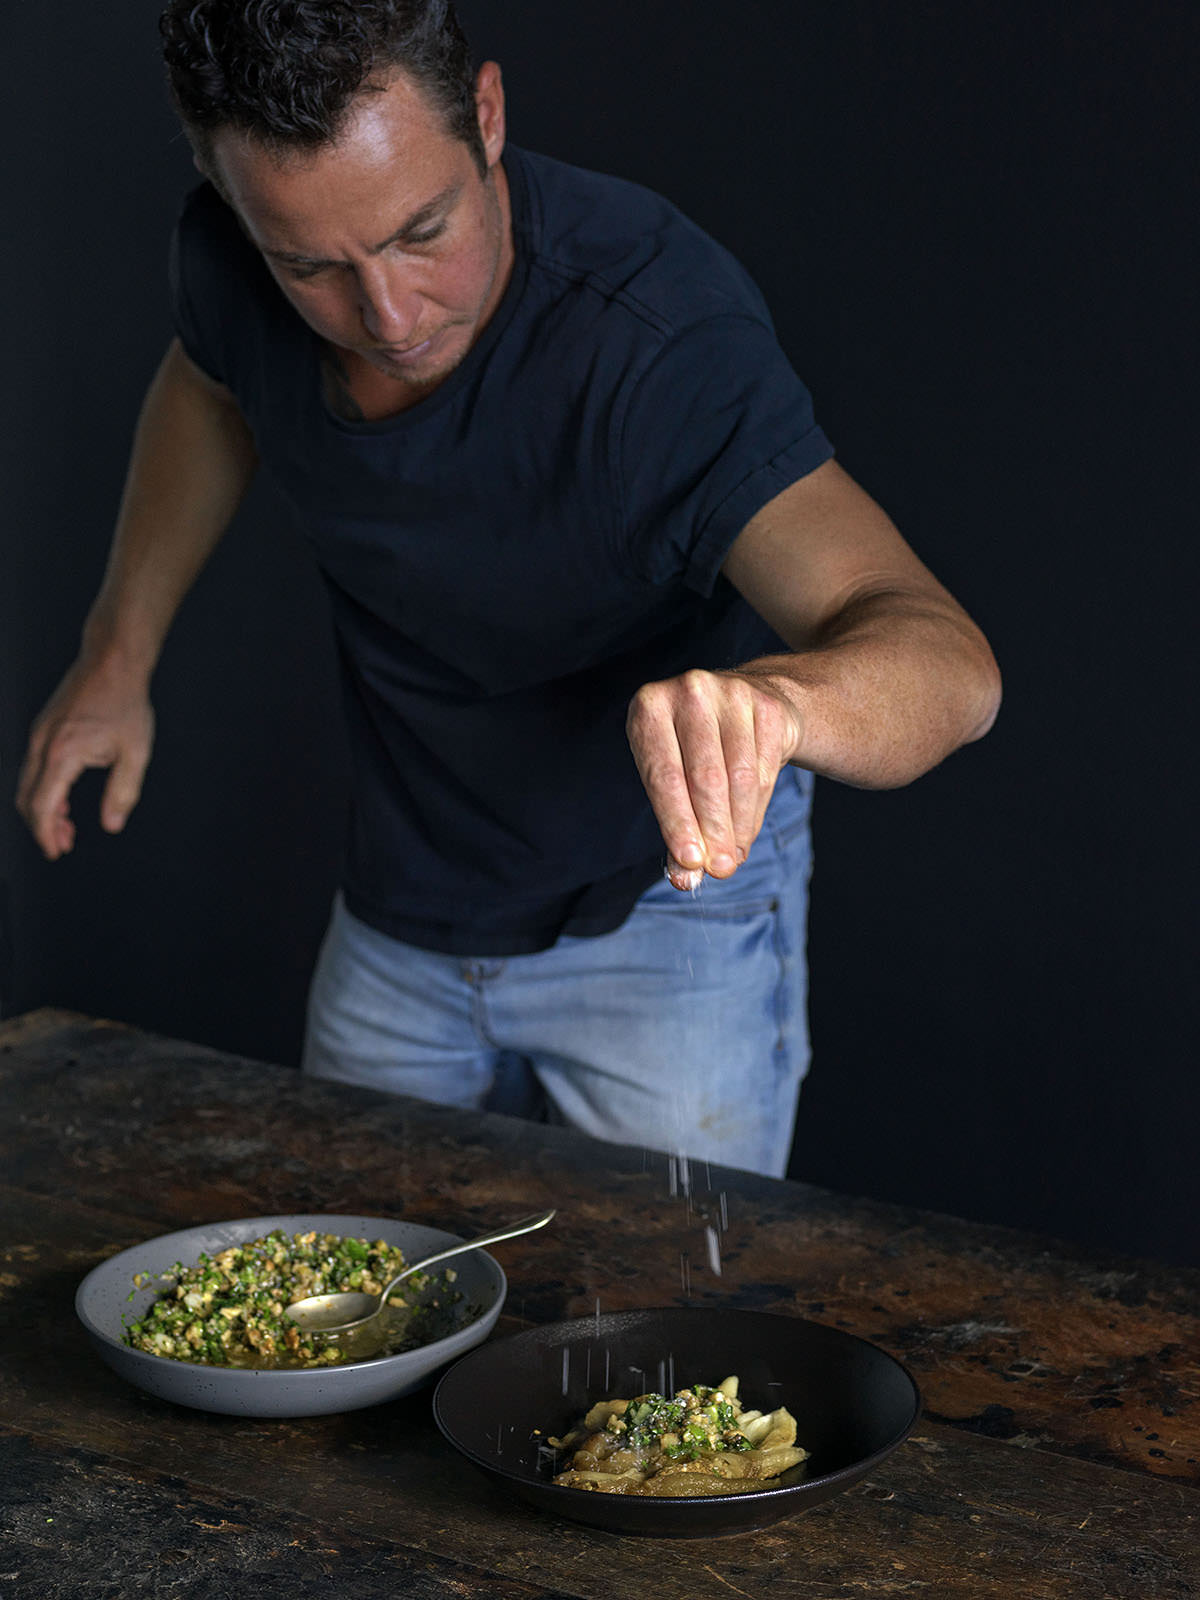 Tom seasoning his smoky eggplant to accompany the flat iron.